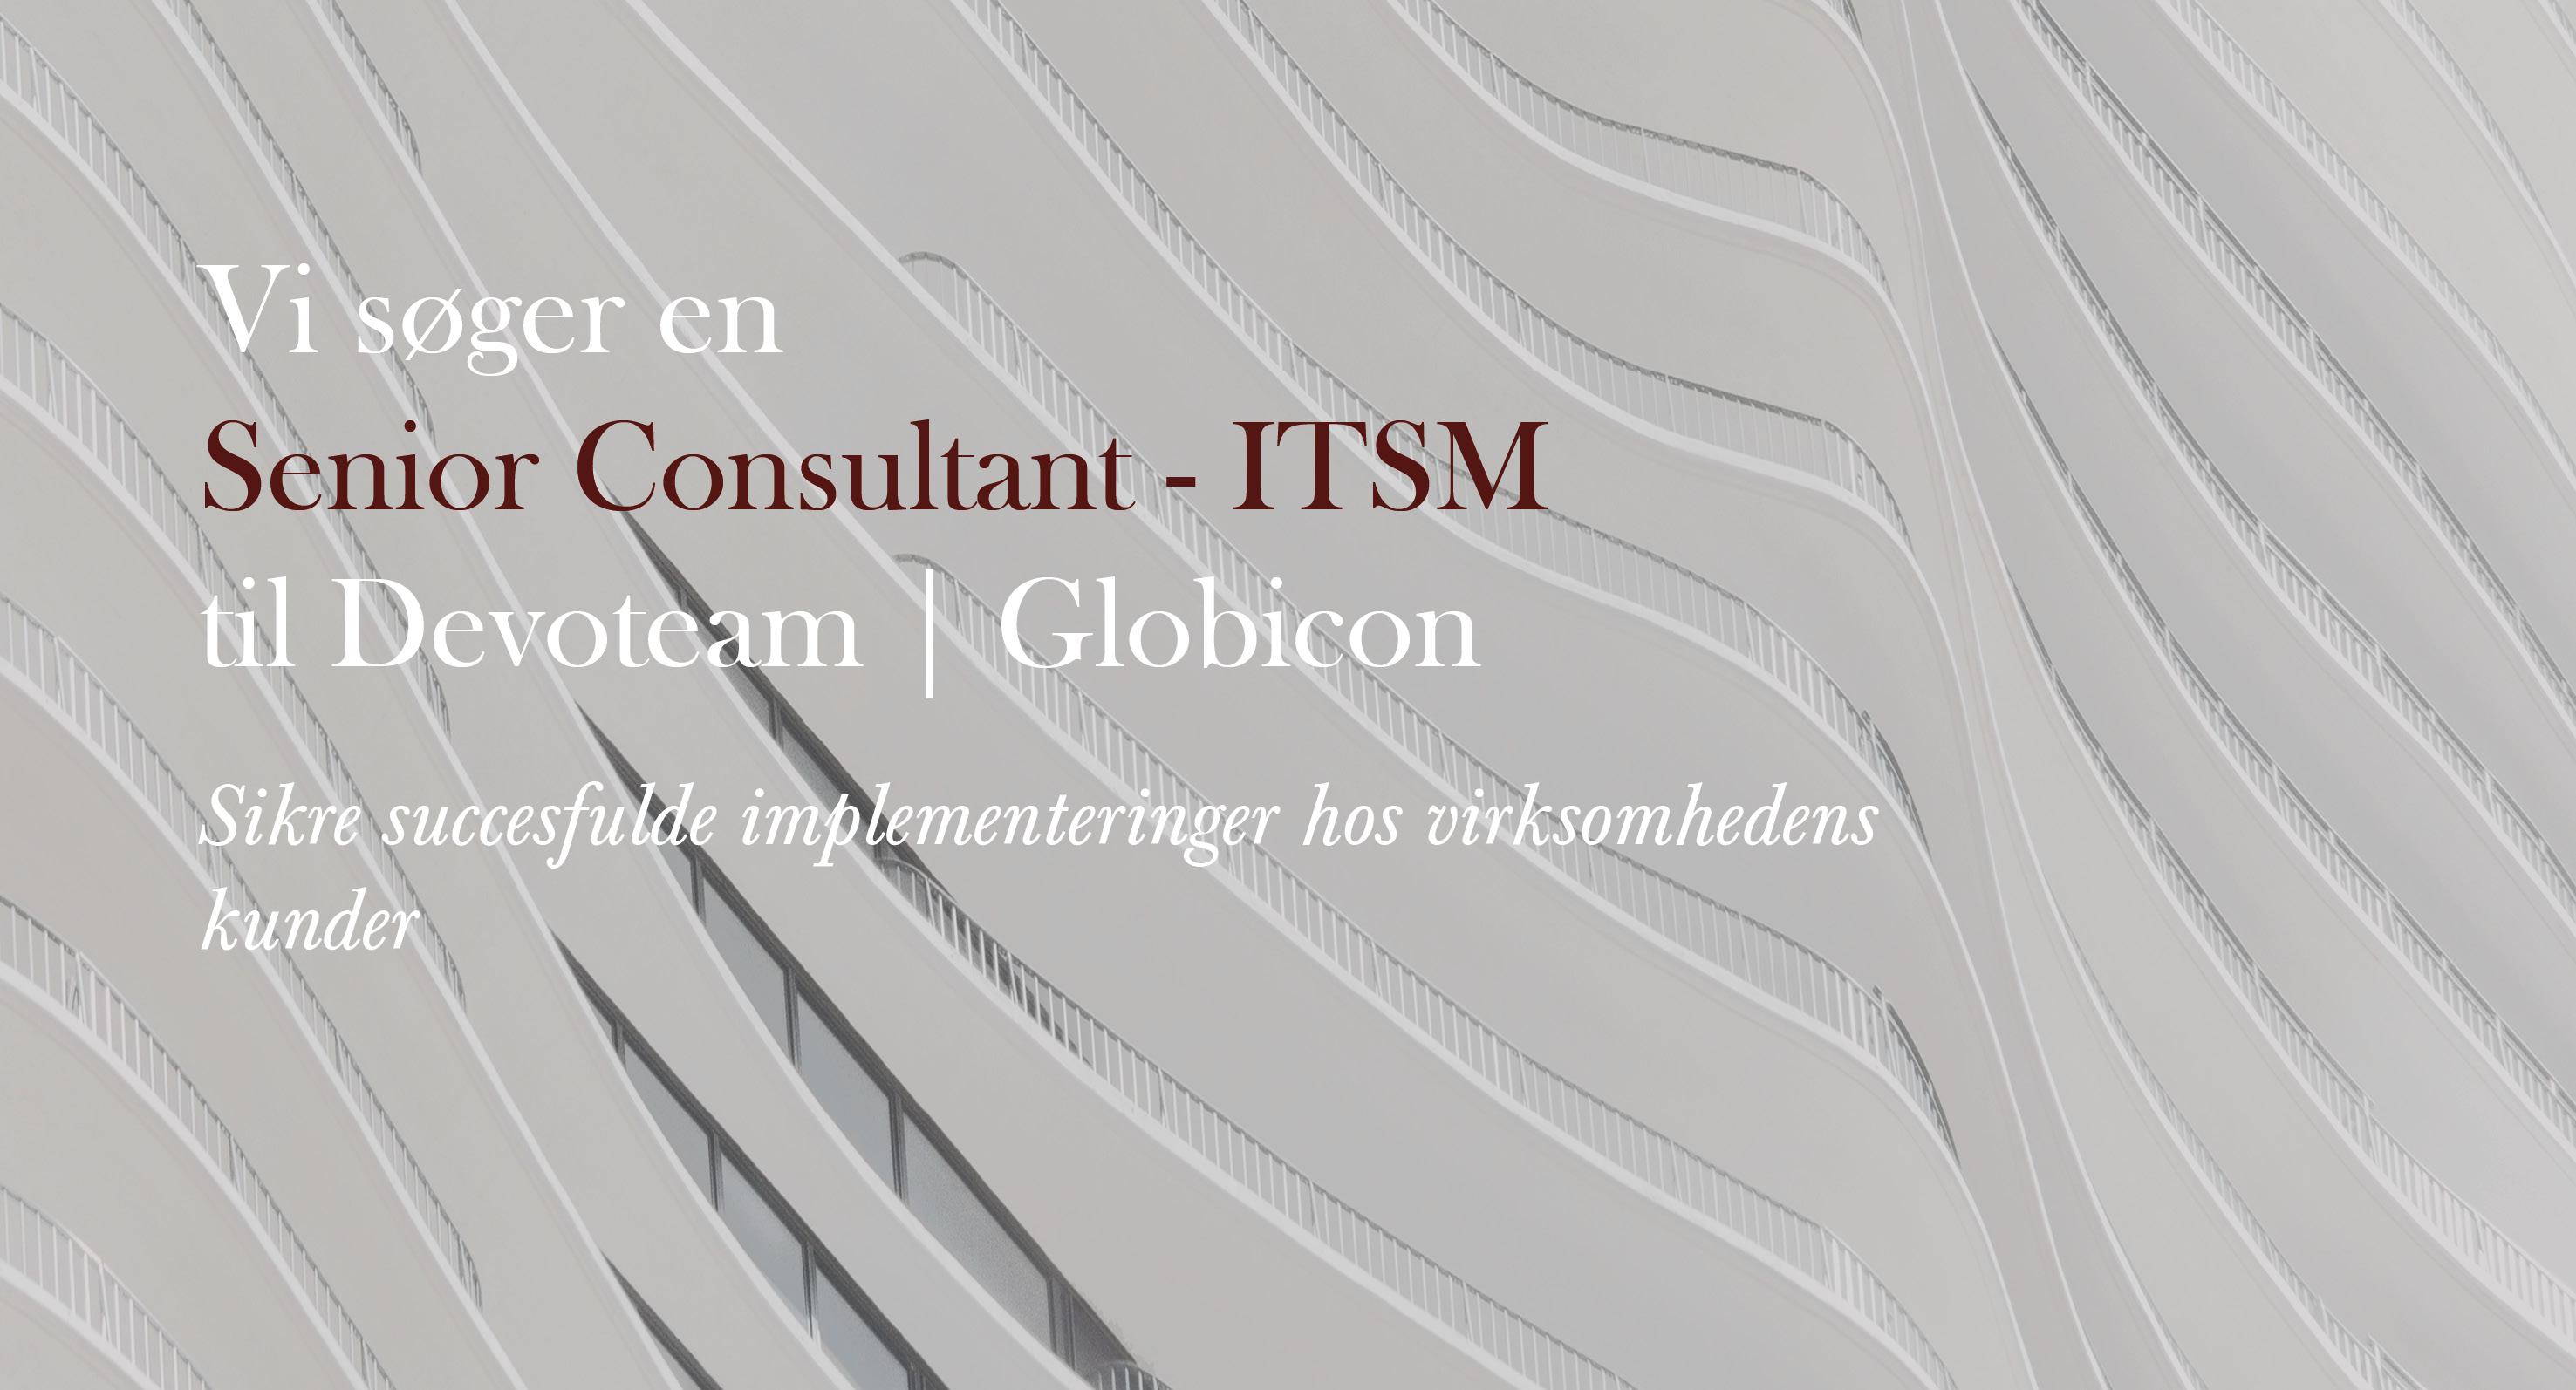 Senio Consultant - ITSM - Devoteam - Globicon